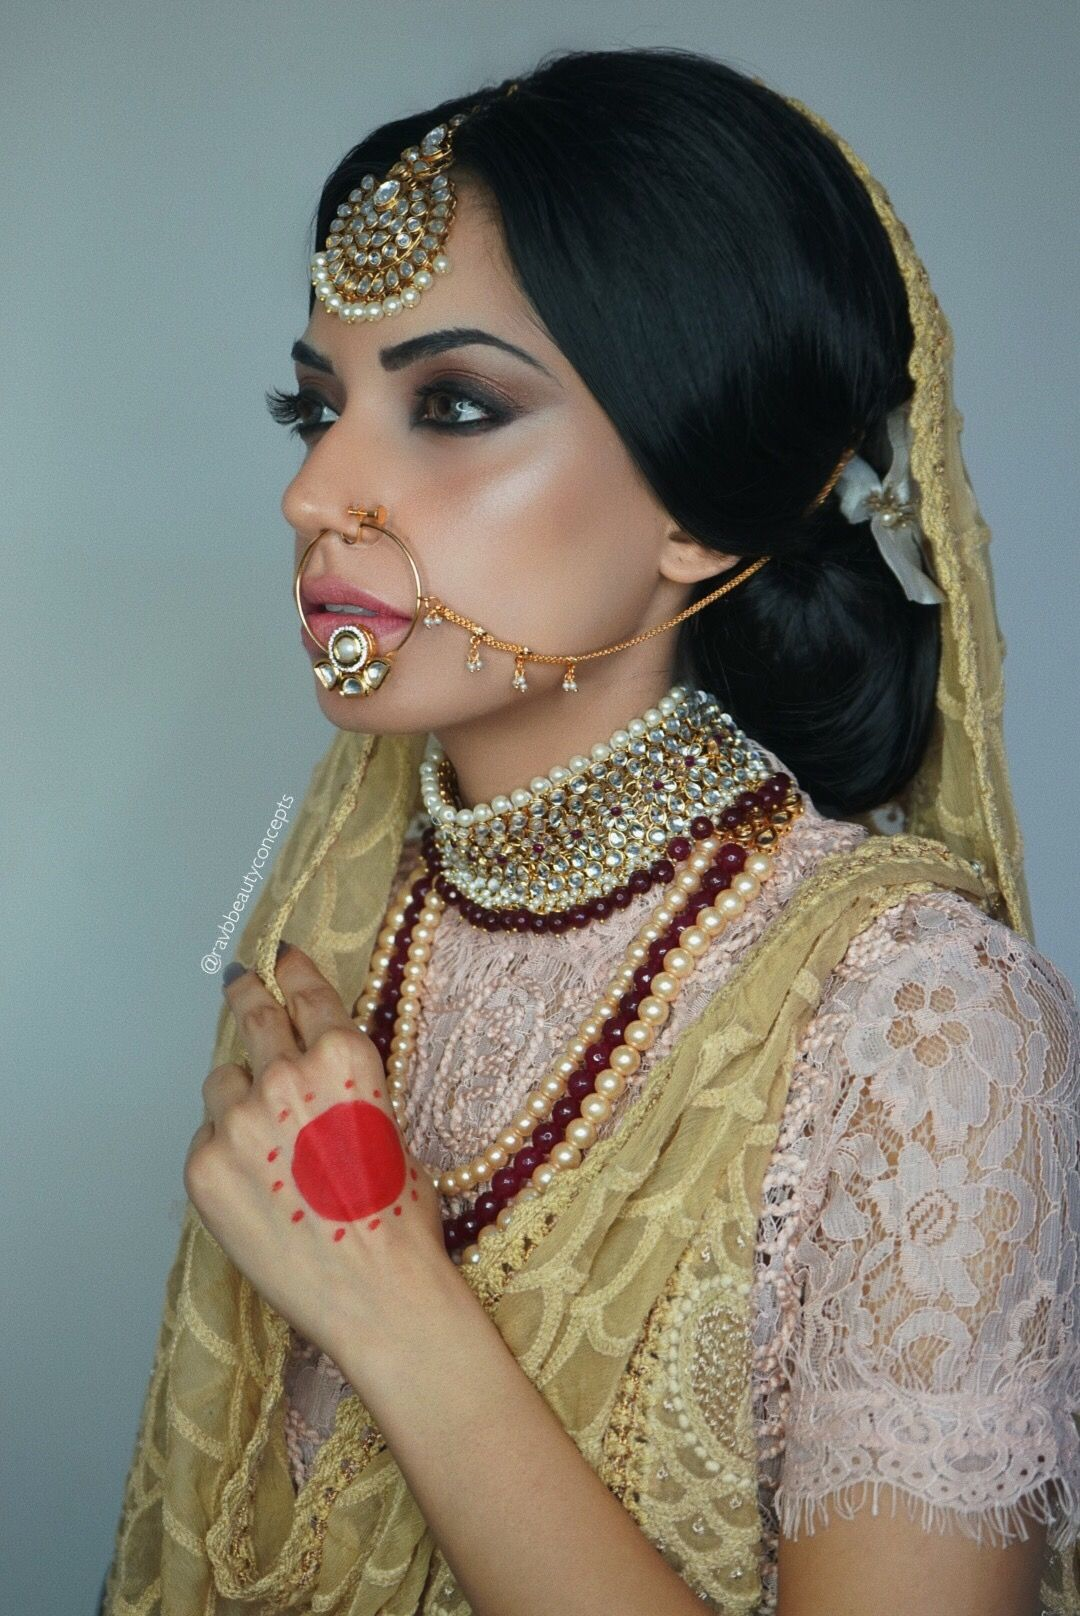 Indian Bridal Makeup Indian Bridal Hair Bridal Makeup Bridal Hair Wedding Makeup Wedding Hair South Asian Indian Bridal Makeup Bridal Makeup Asian Bride